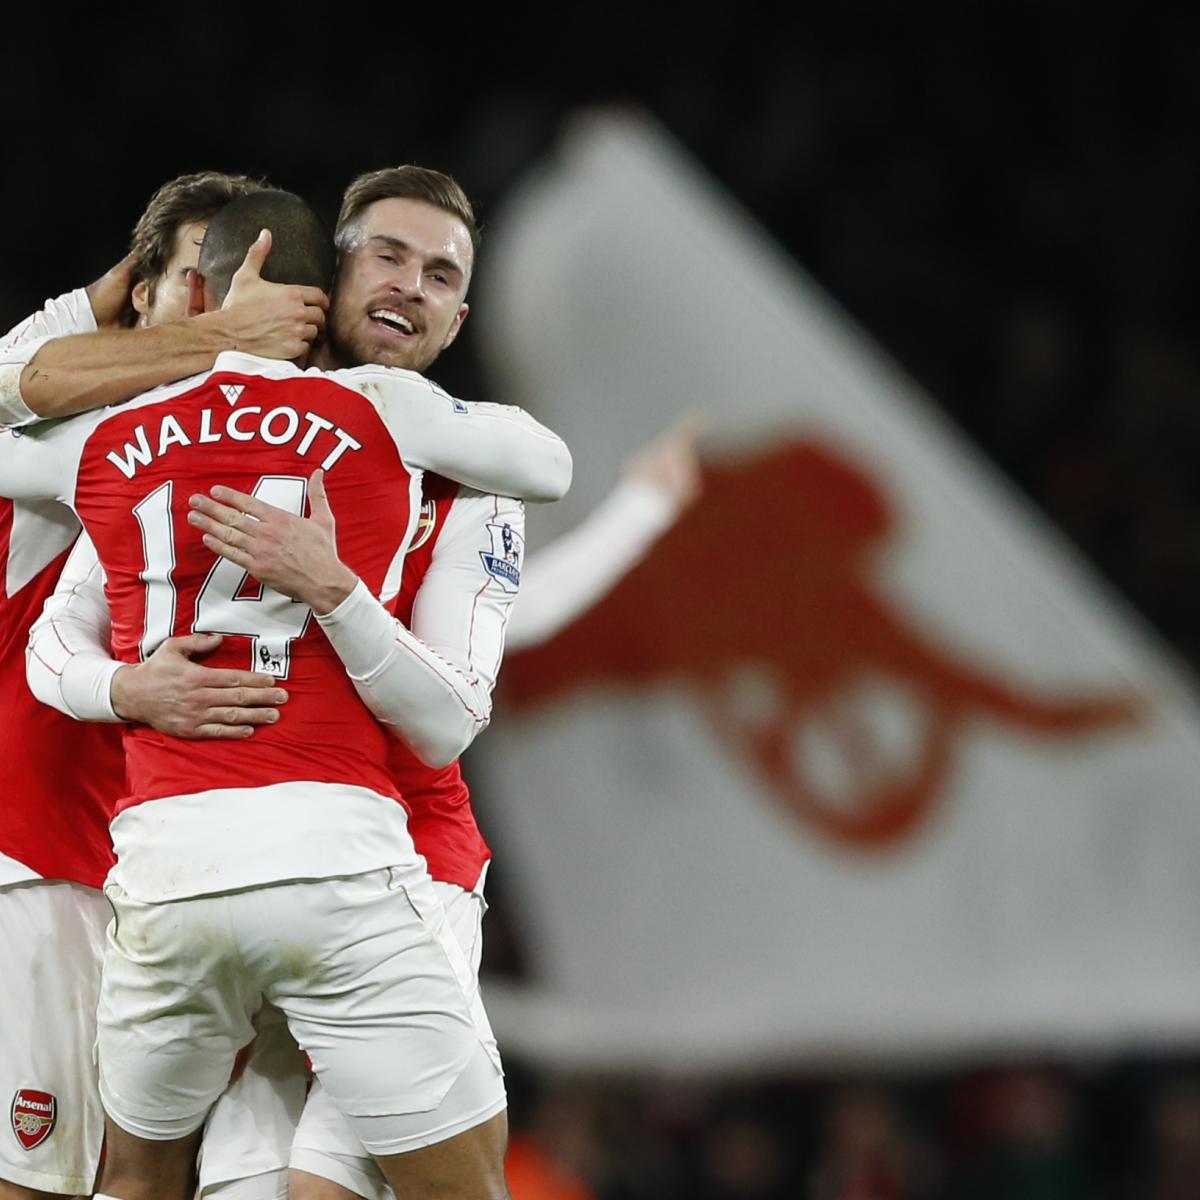 Arsenal Vs Tottenham Live Score Highlights From Premier: Arsenal Vs. Manchester City: Live Score, Highlights From